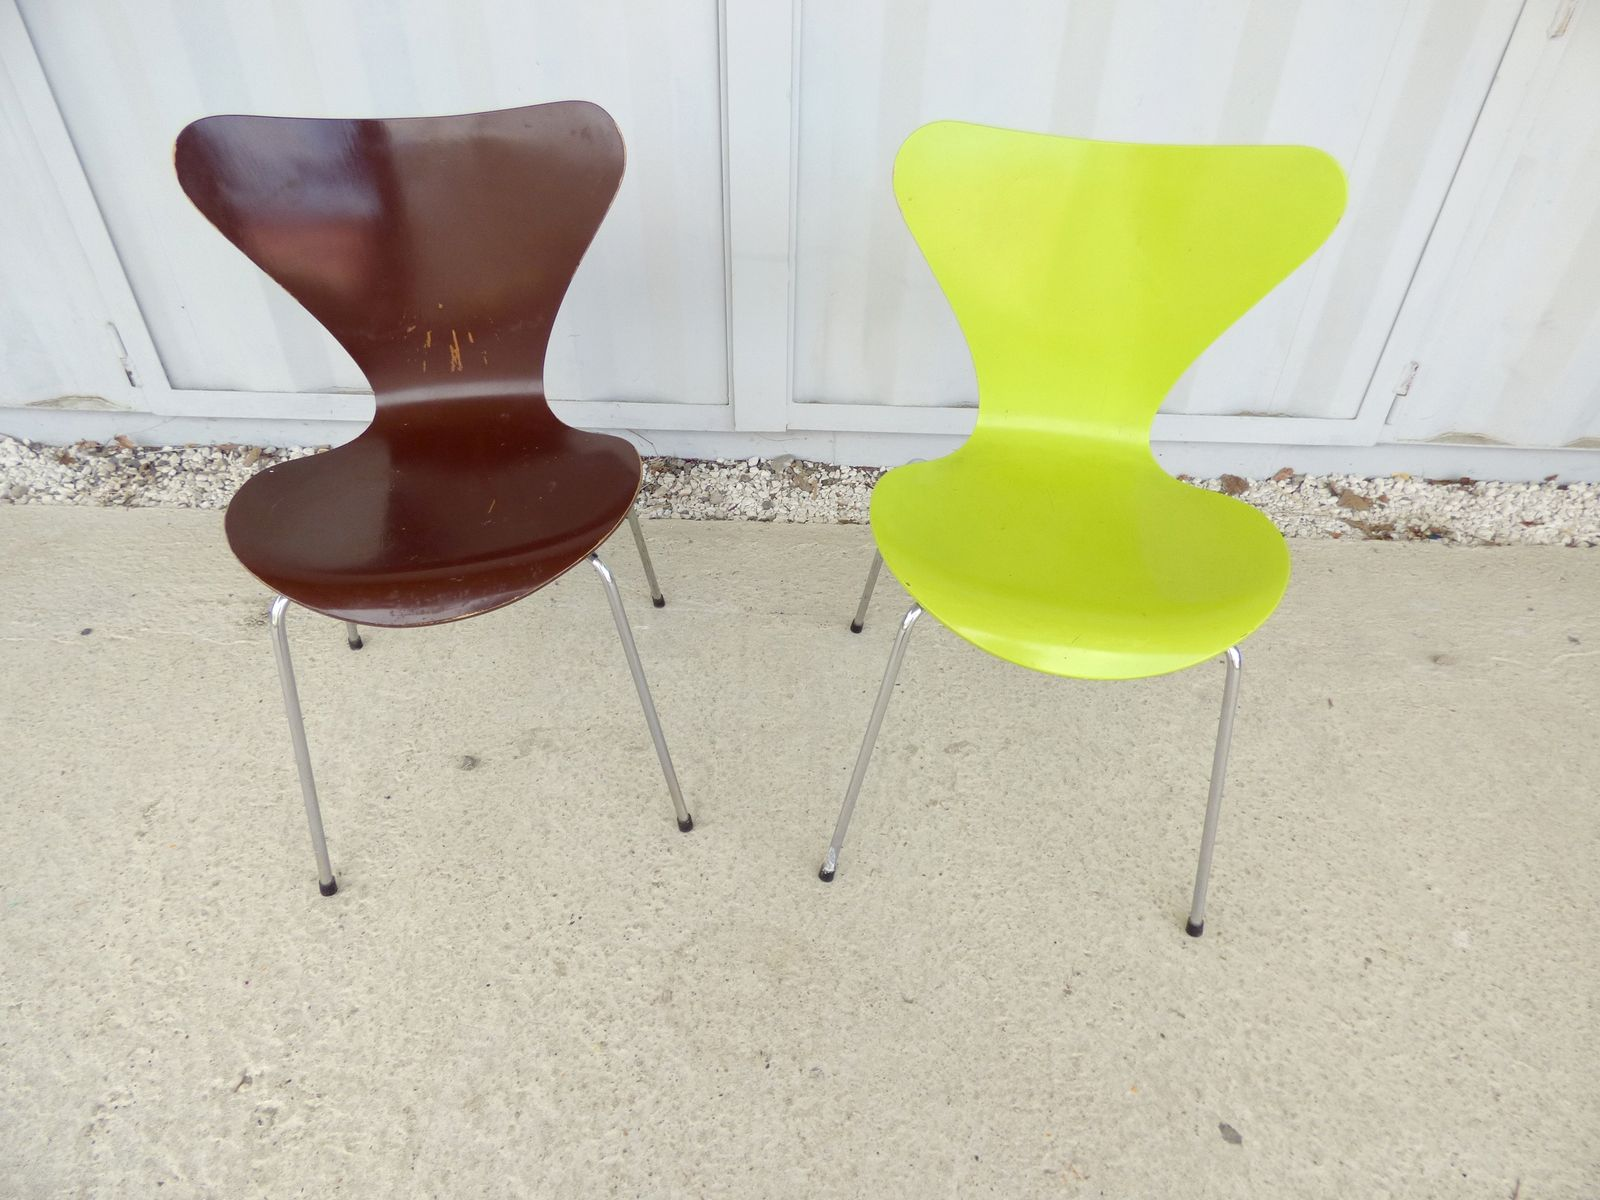 series 7 st hle von arne jacobsen f r fritz hansen 1985. Black Bedroom Furniture Sets. Home Design Ideas